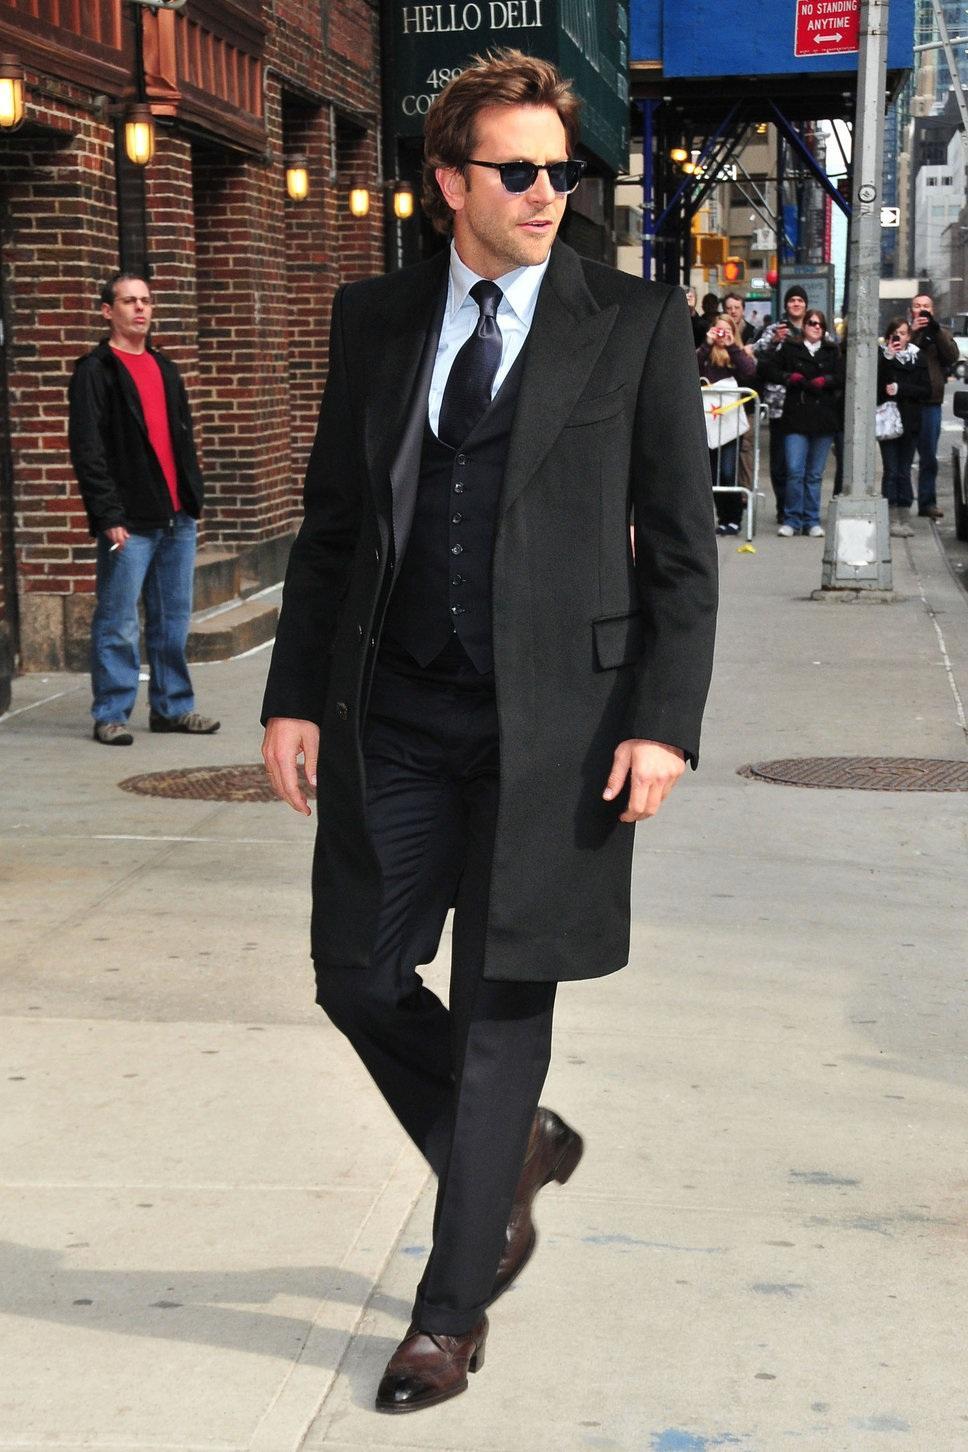 bradley-cooper-black-coat-sung-fashion-634378088.jpg